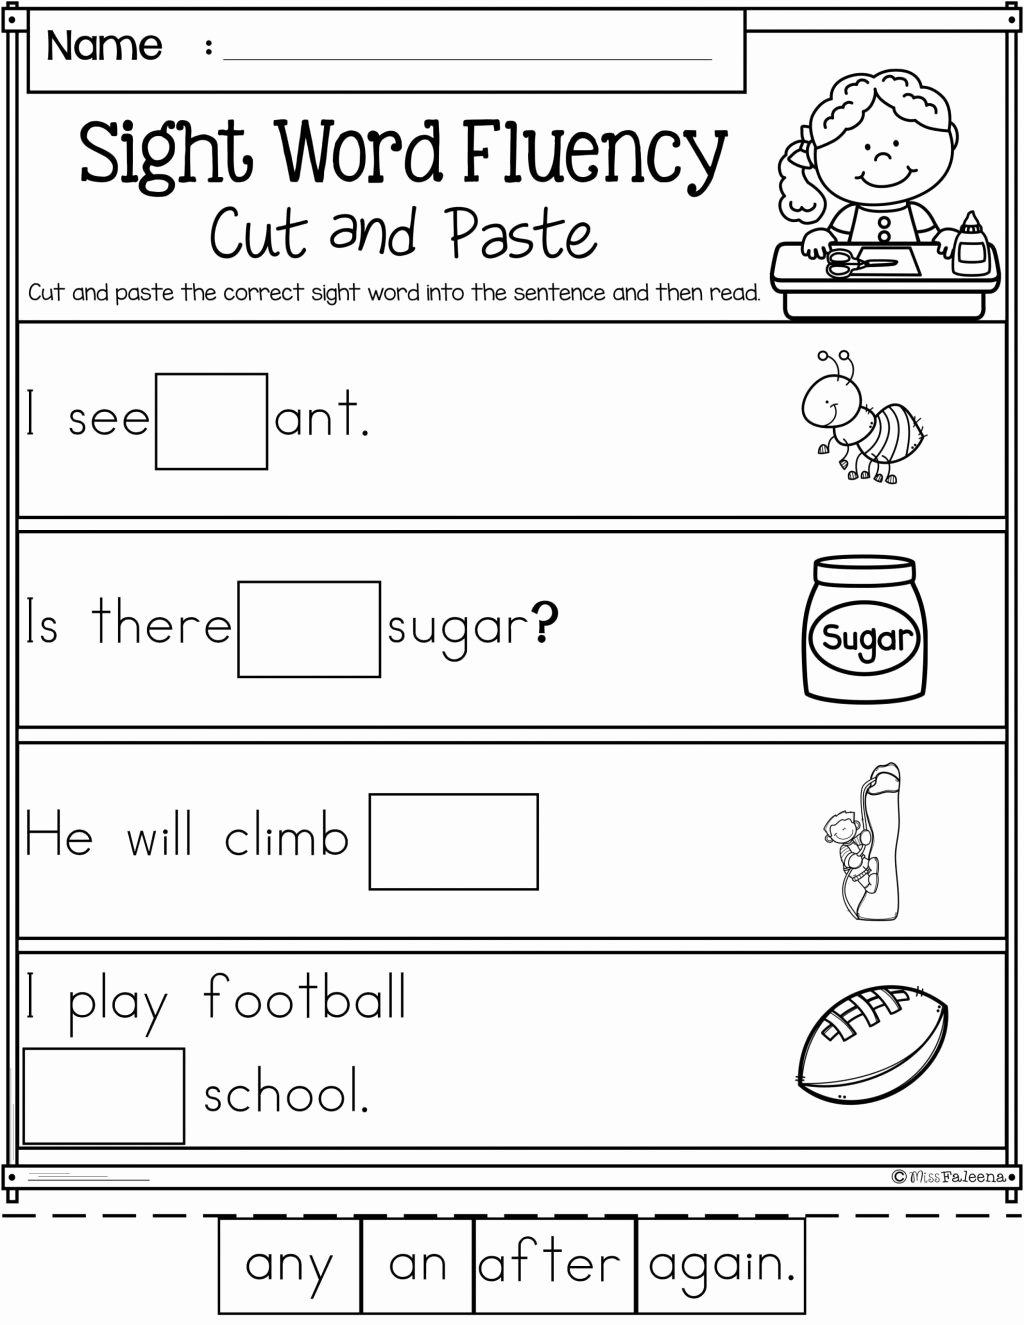 Reading Readiness Worksheets for Preschoolers Beautiful Worksheet Worksheet Ideas Free Printable Worksheets forn